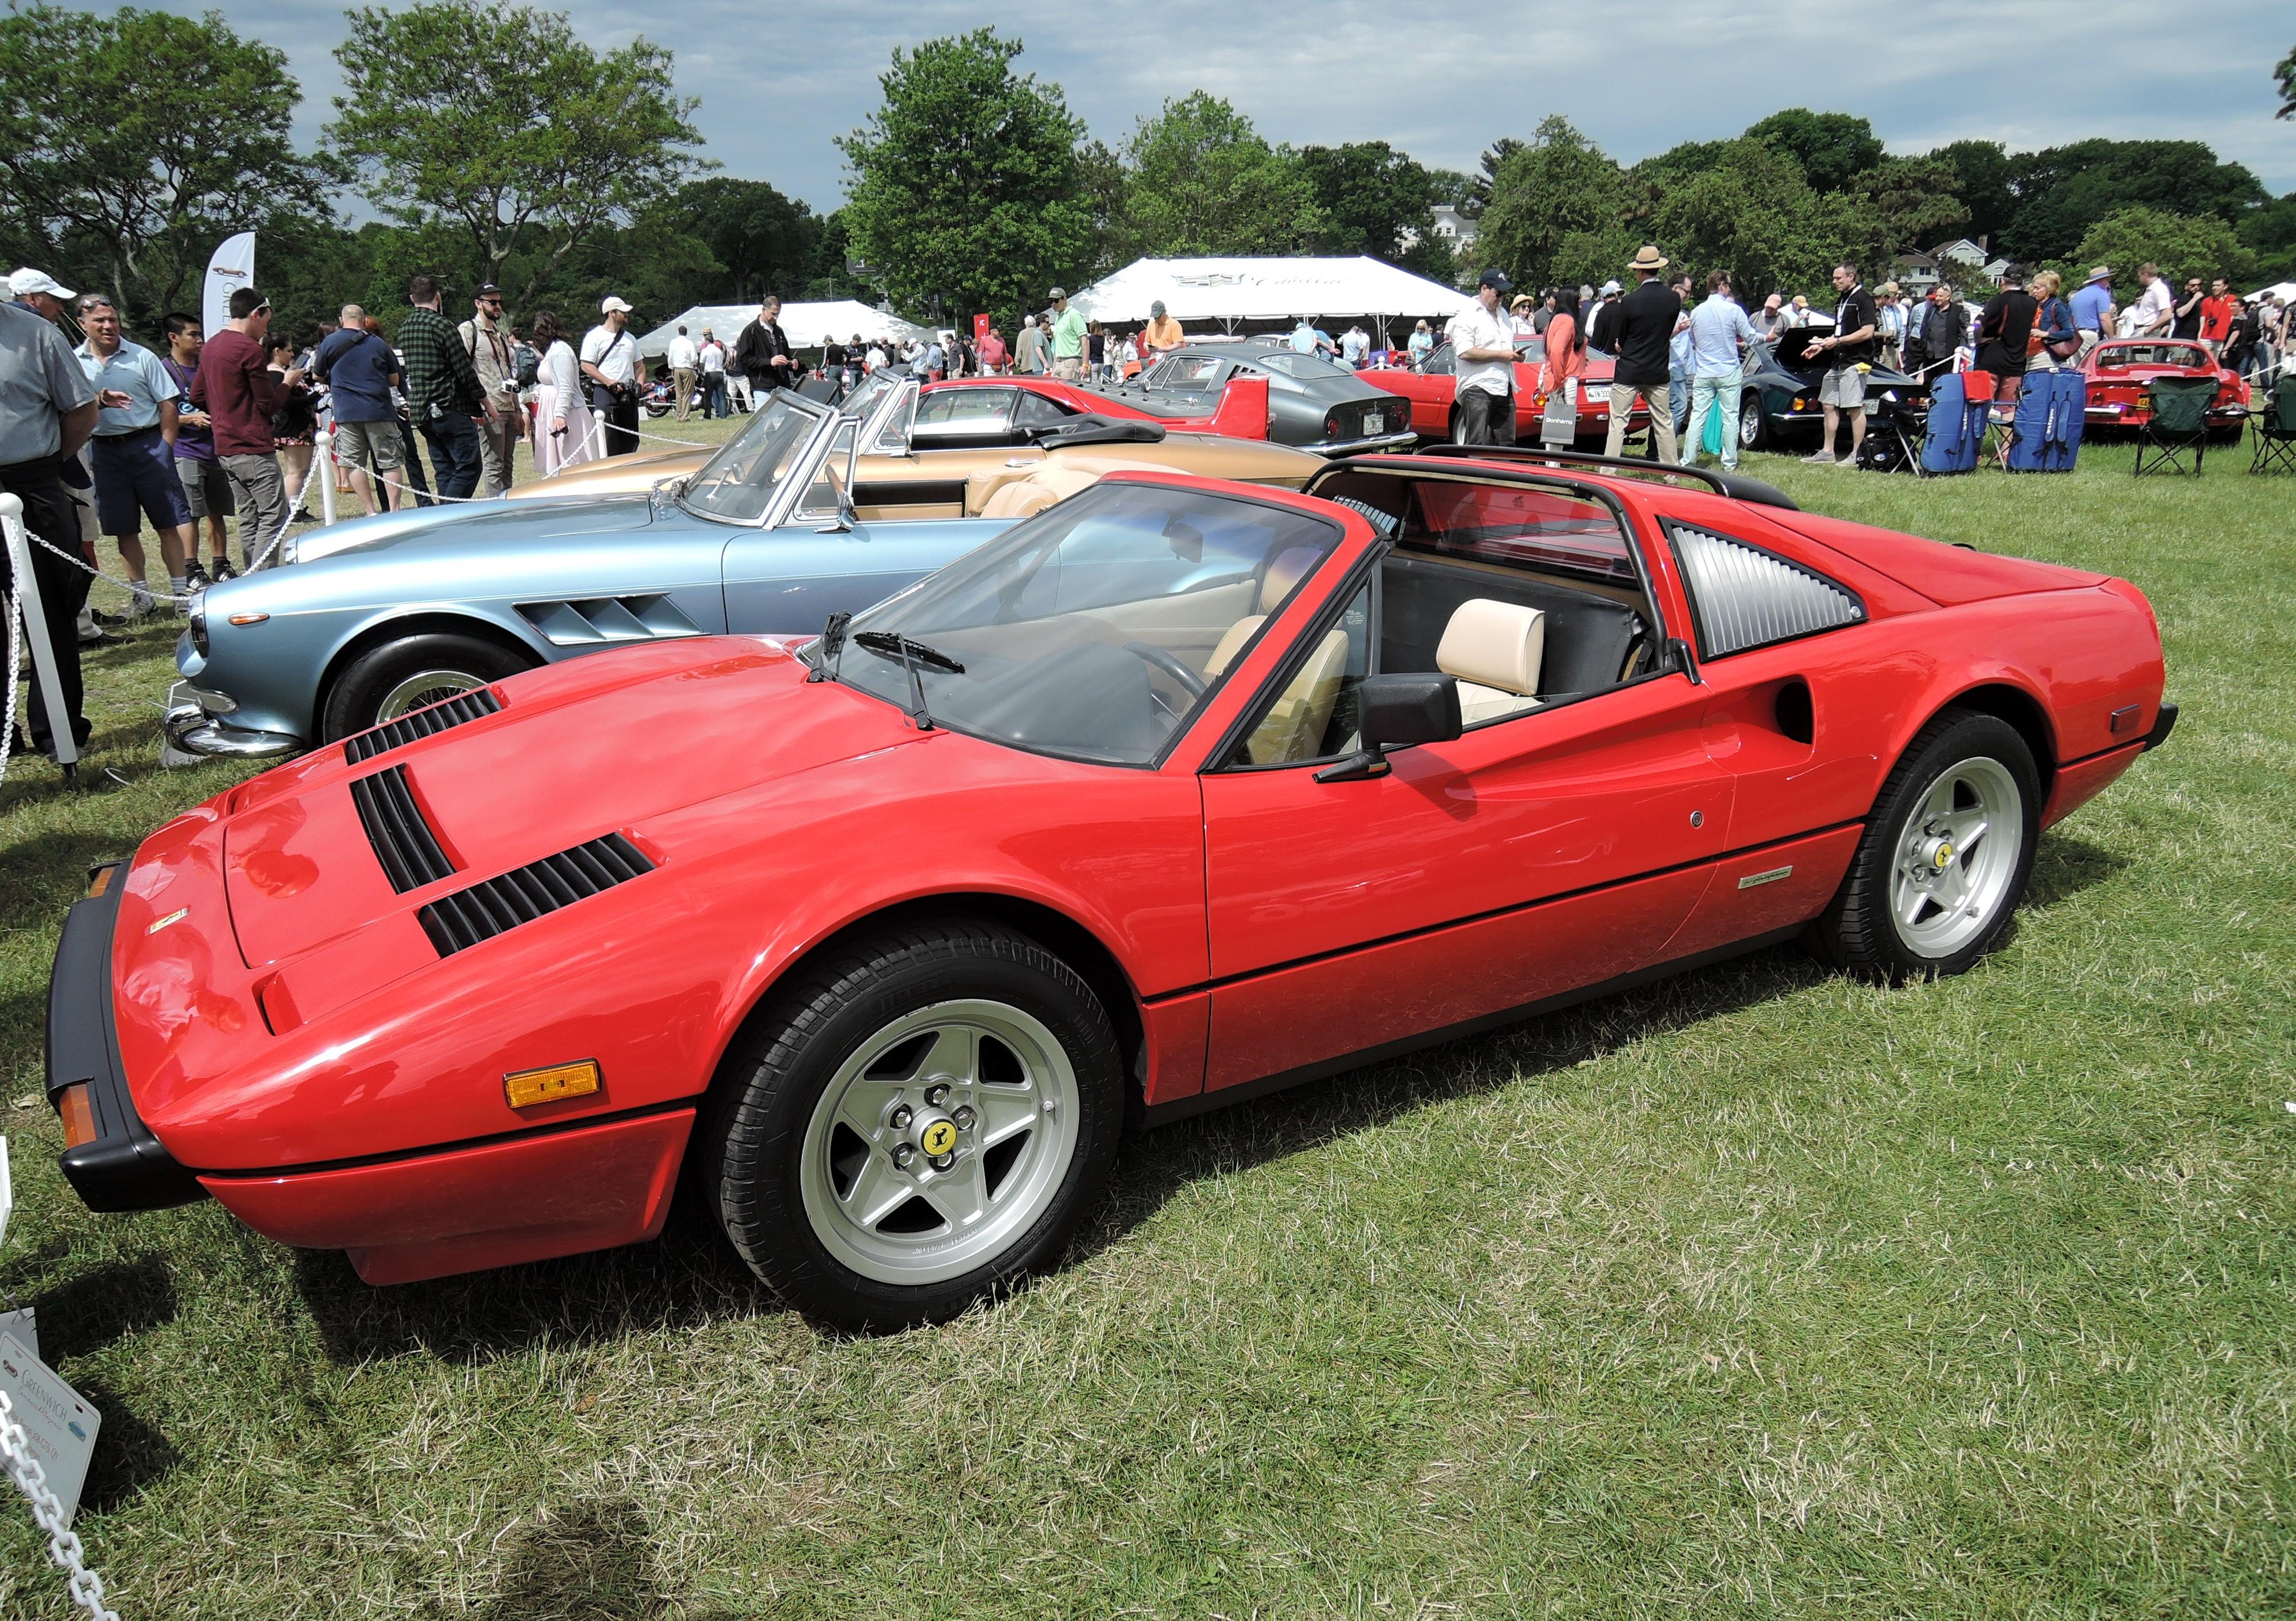 red 1984 Ferrari 308 GTSi QV - Greenwich Concours d'Elegance 2017